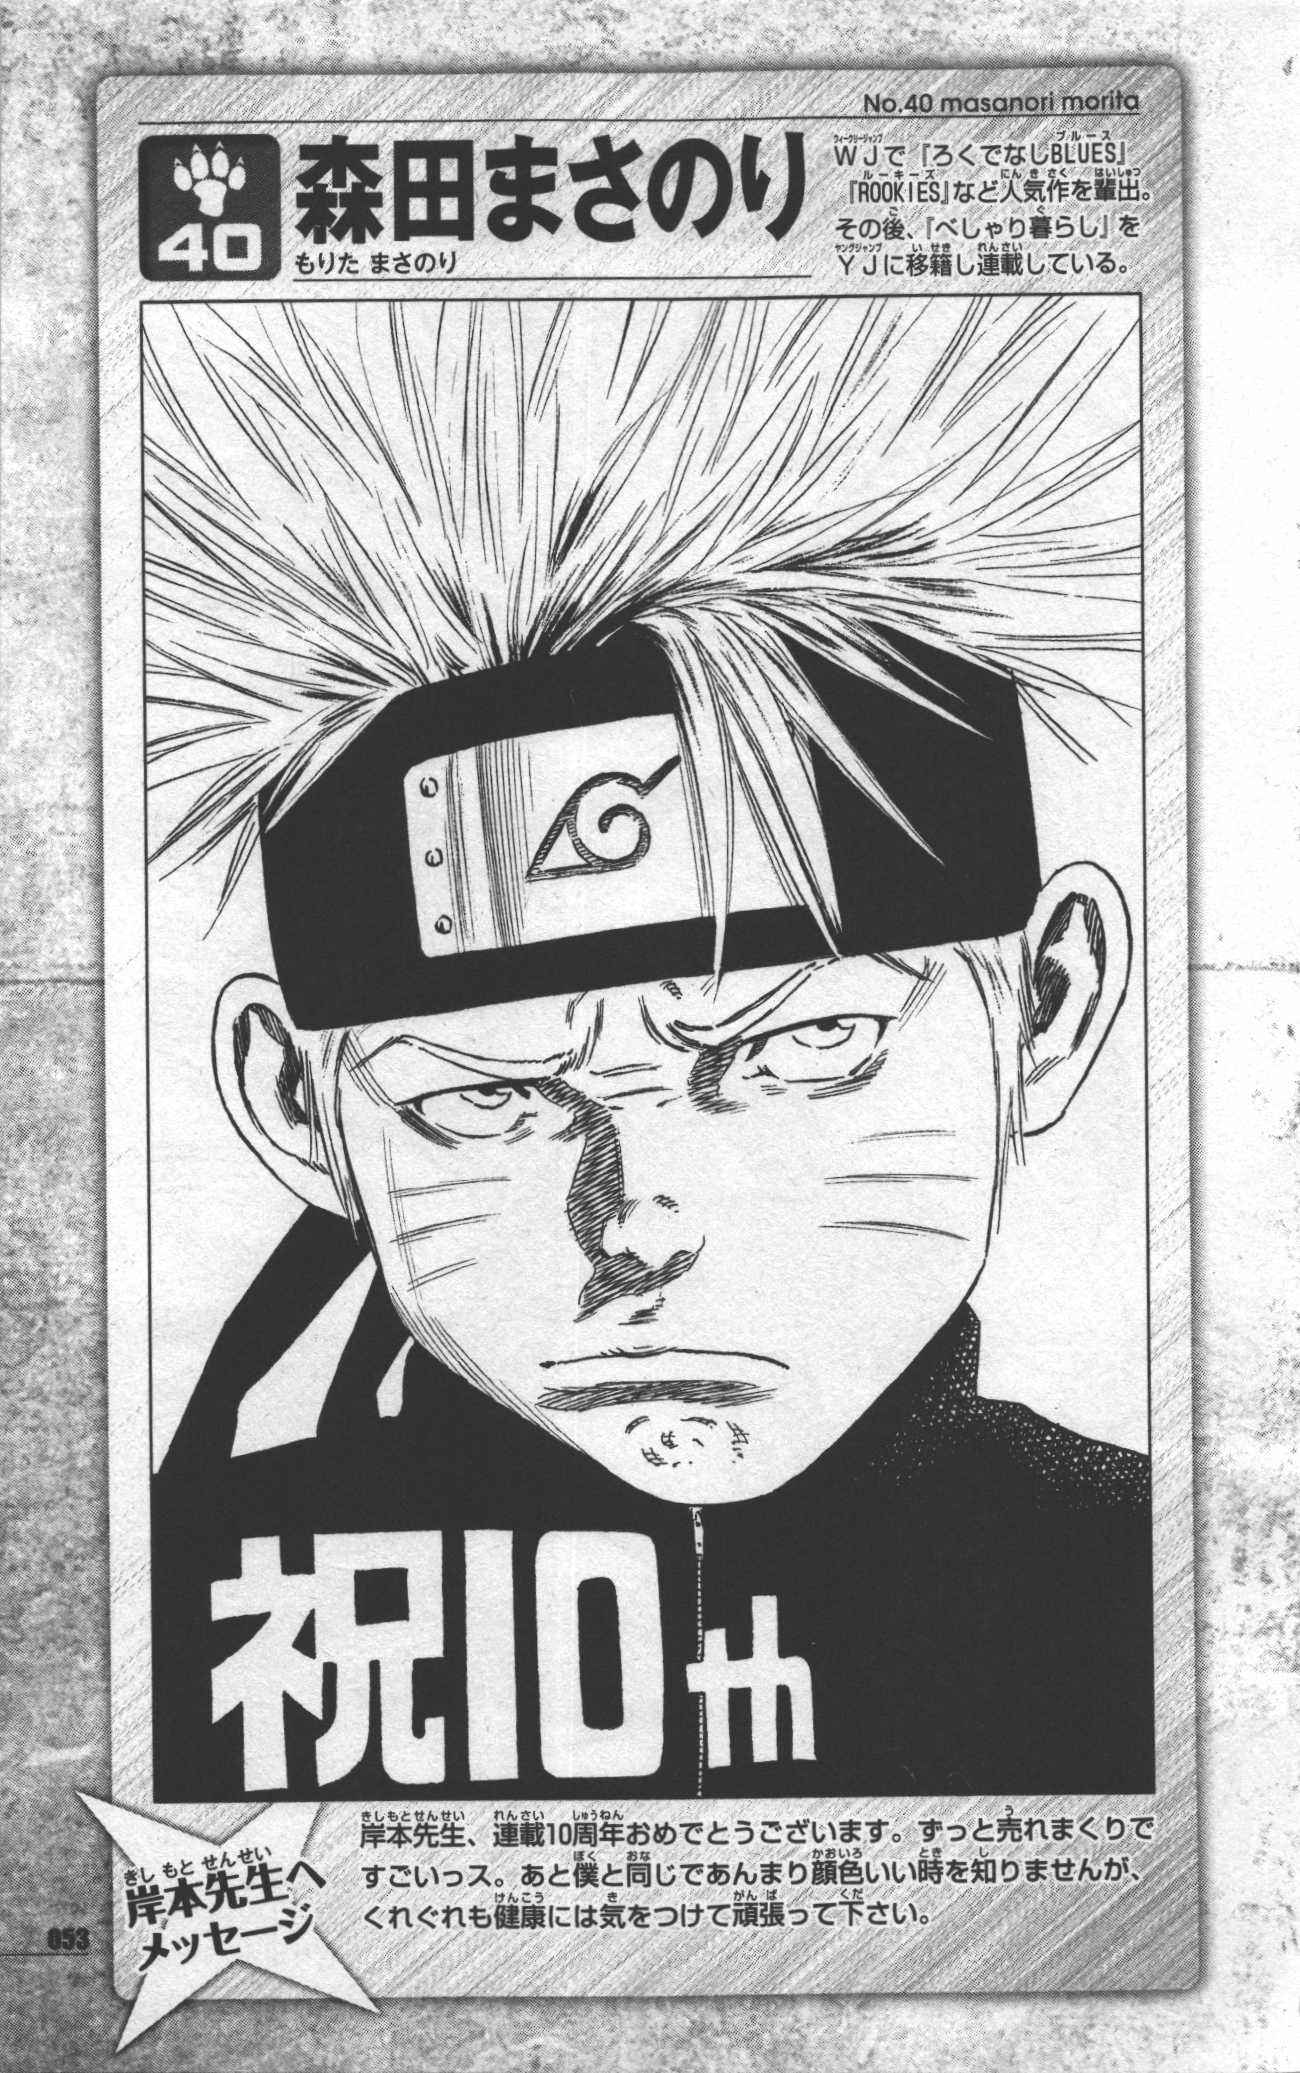 Drawn naruto different style Popular Masanori (Rookies) Naruto Anniversary